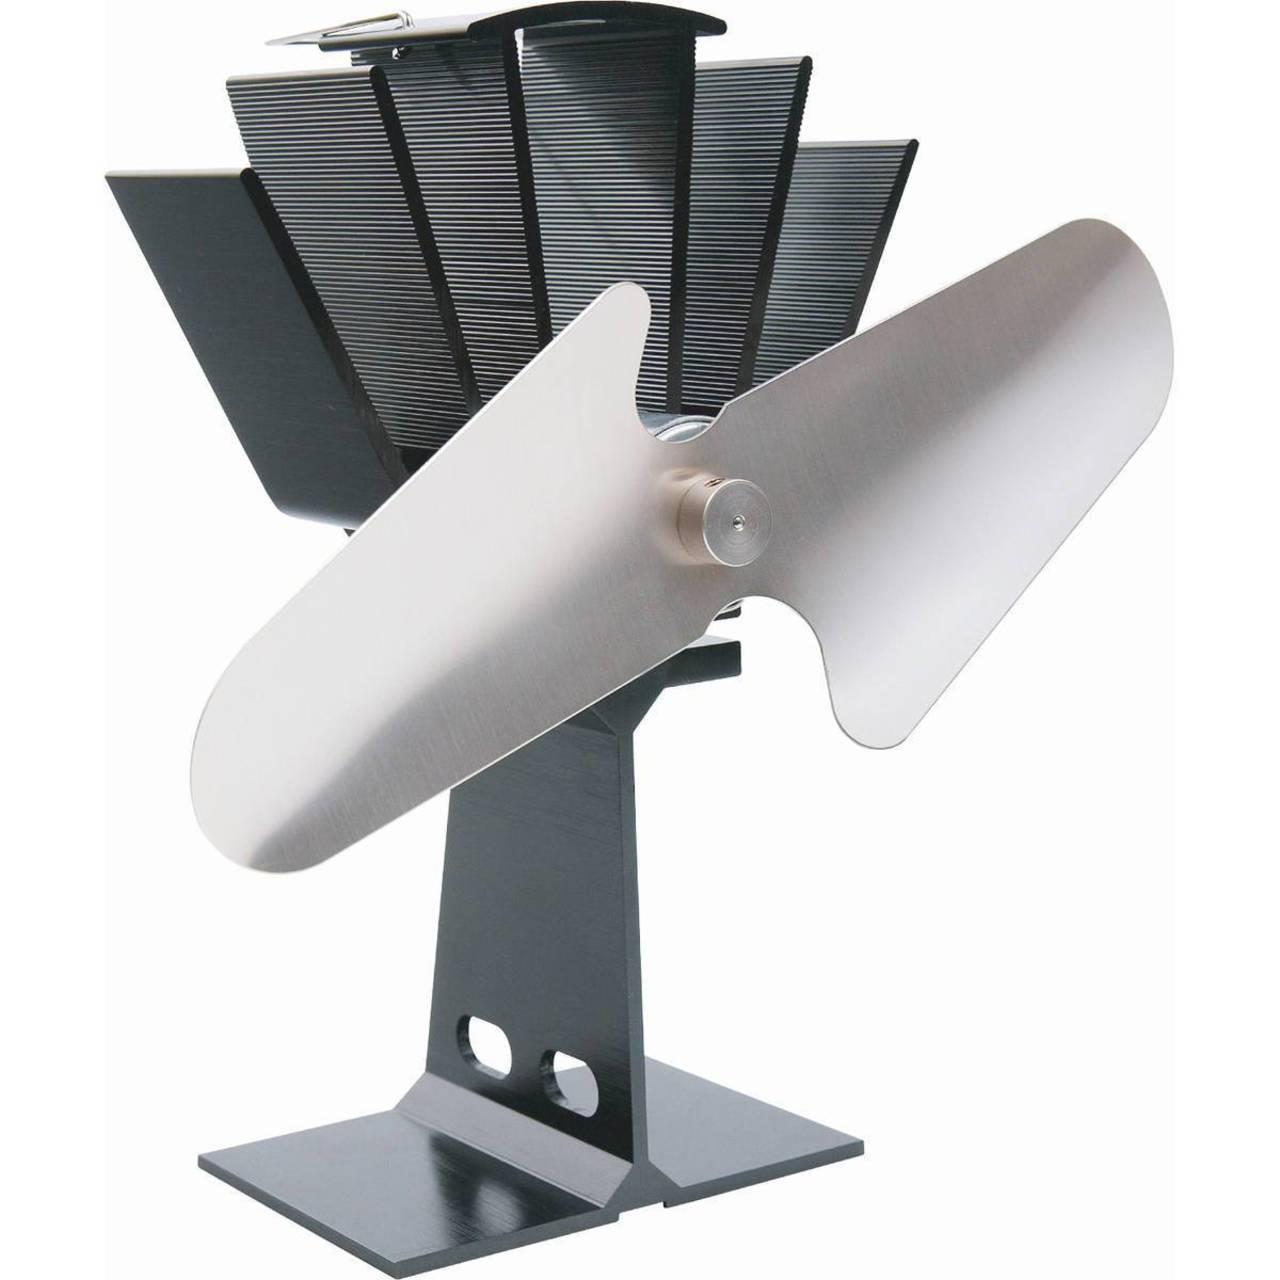 el fuego stromloser kaminventilator aus aluminium schwarz ventilator ofen ebay. Black Bedroom Furniture Sets. Home Design Ideas